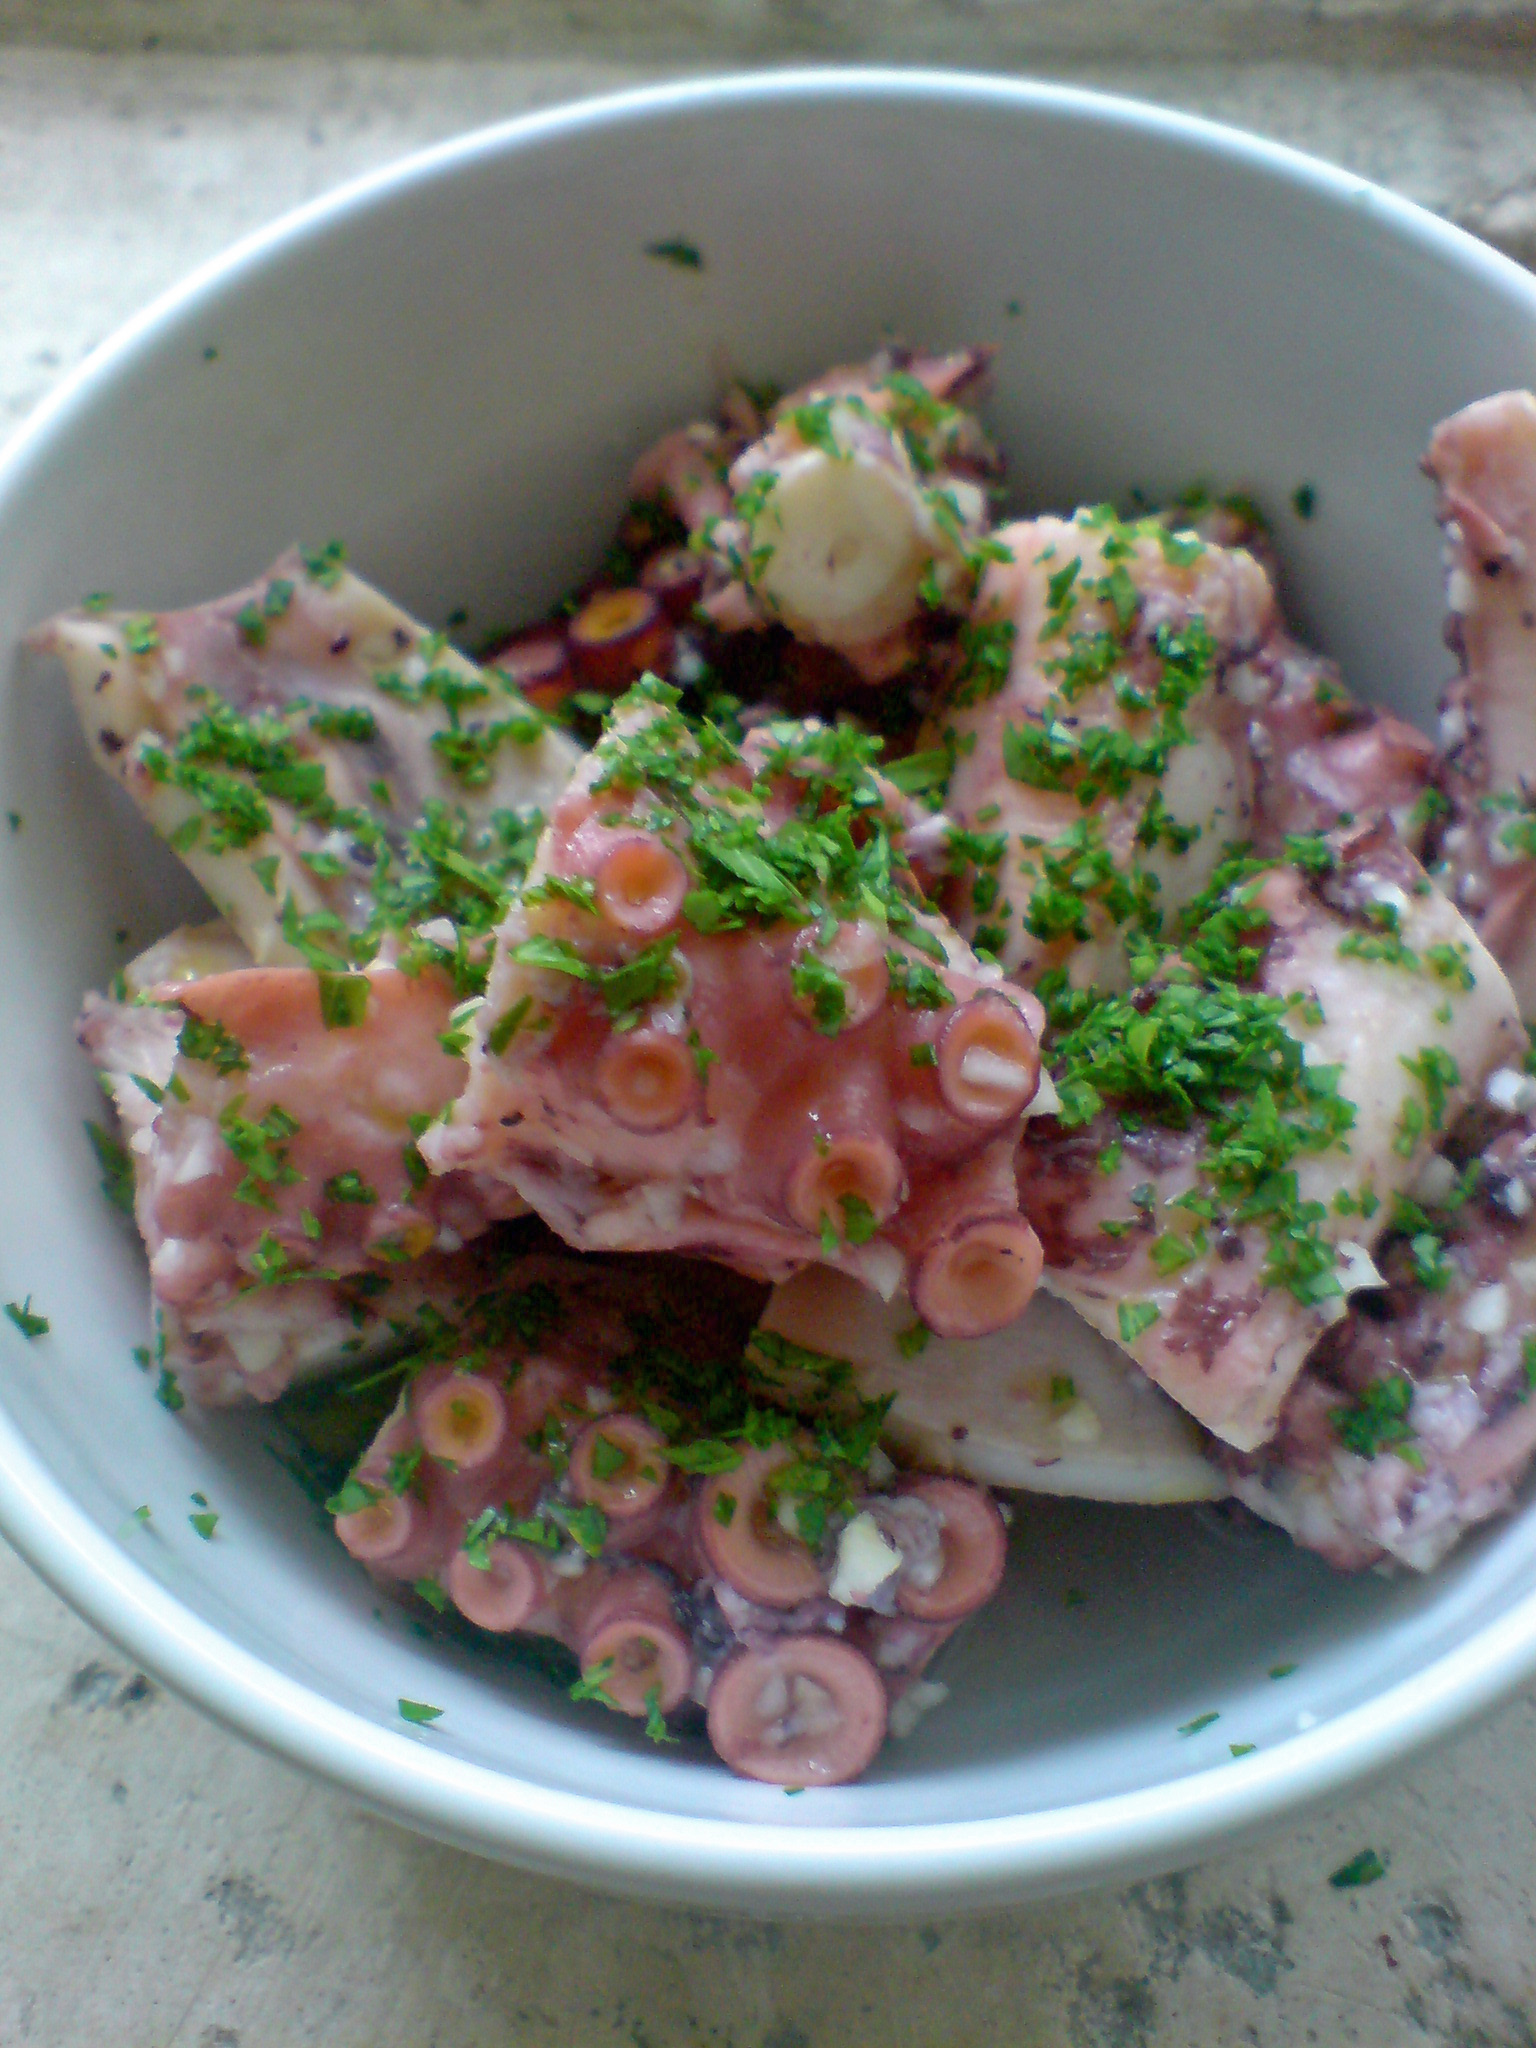 Octopus salad finished dish